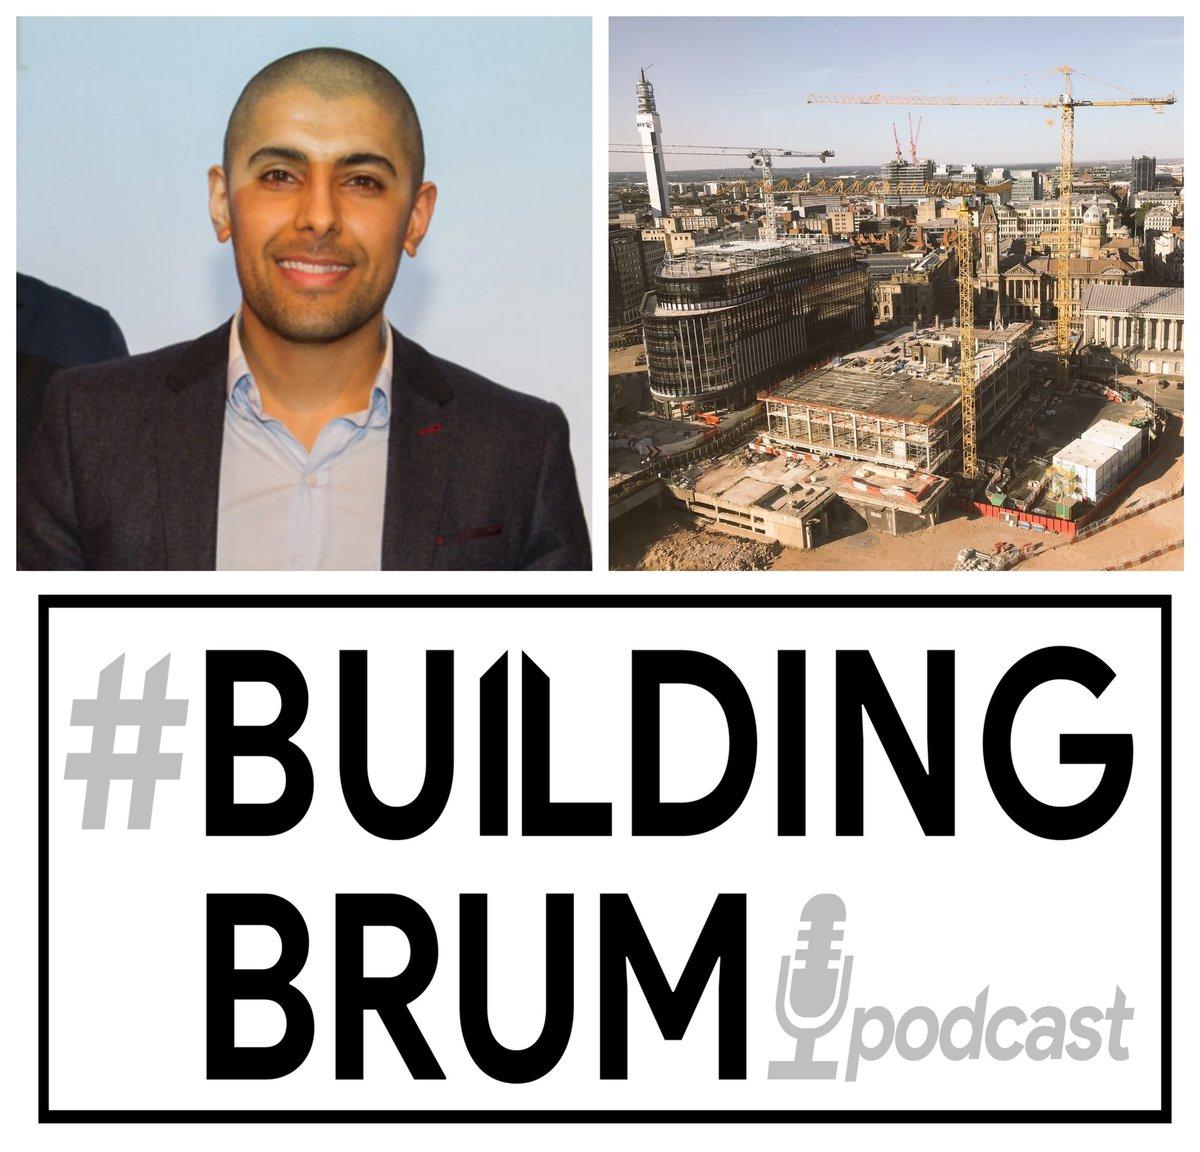 @BuildingBrum latest podcast #BuildingBrum x Sunil Johal is now available:   #SpotifyPodcasts: #ApplePodcasts:  #Podcasts#Construction#ConstructionIndustry#Birmingham